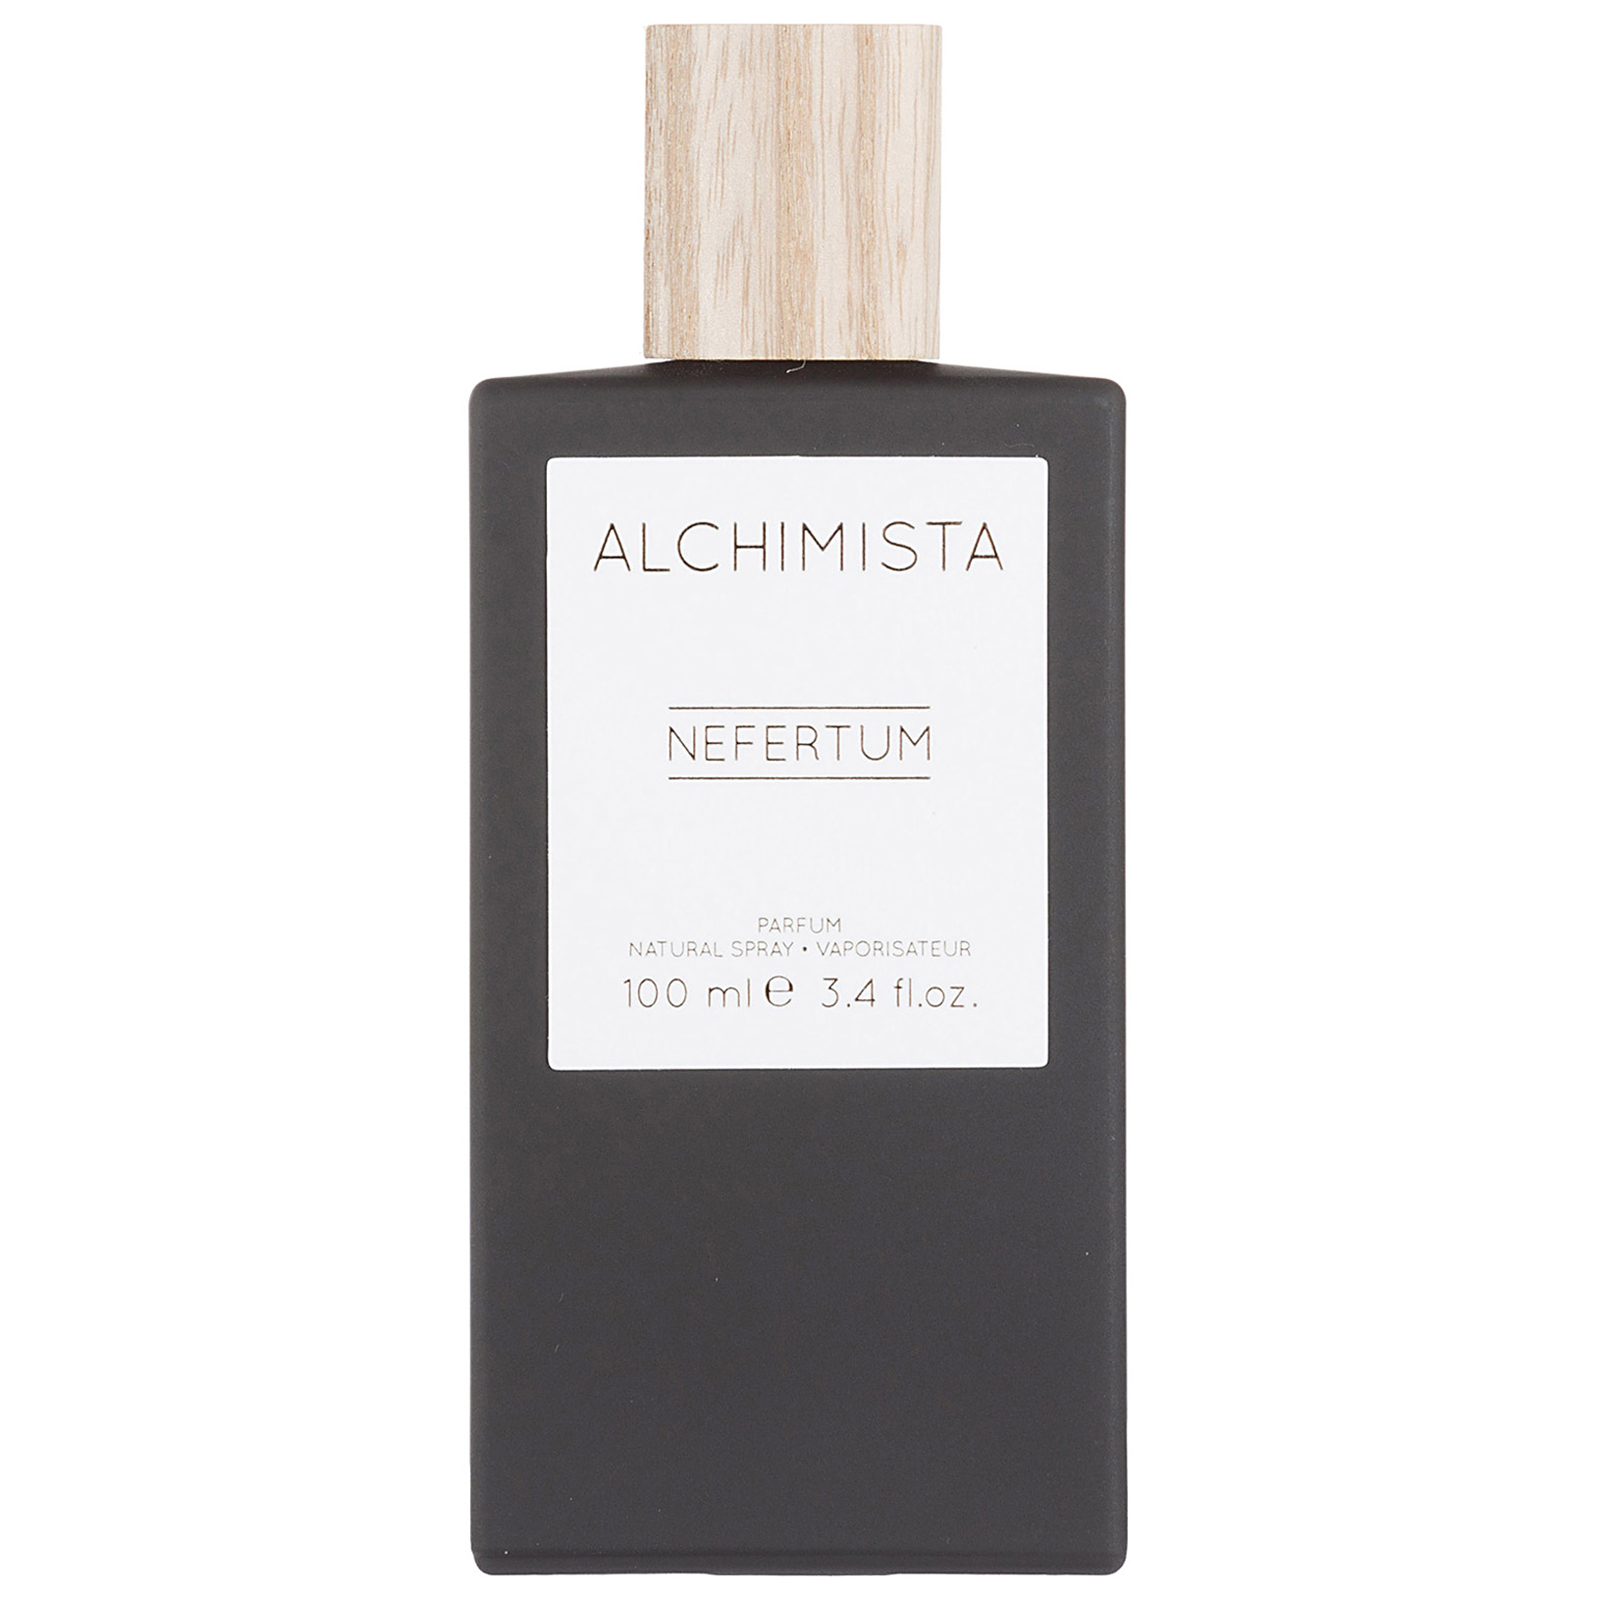 Nefertum profumo parfum 100 ml